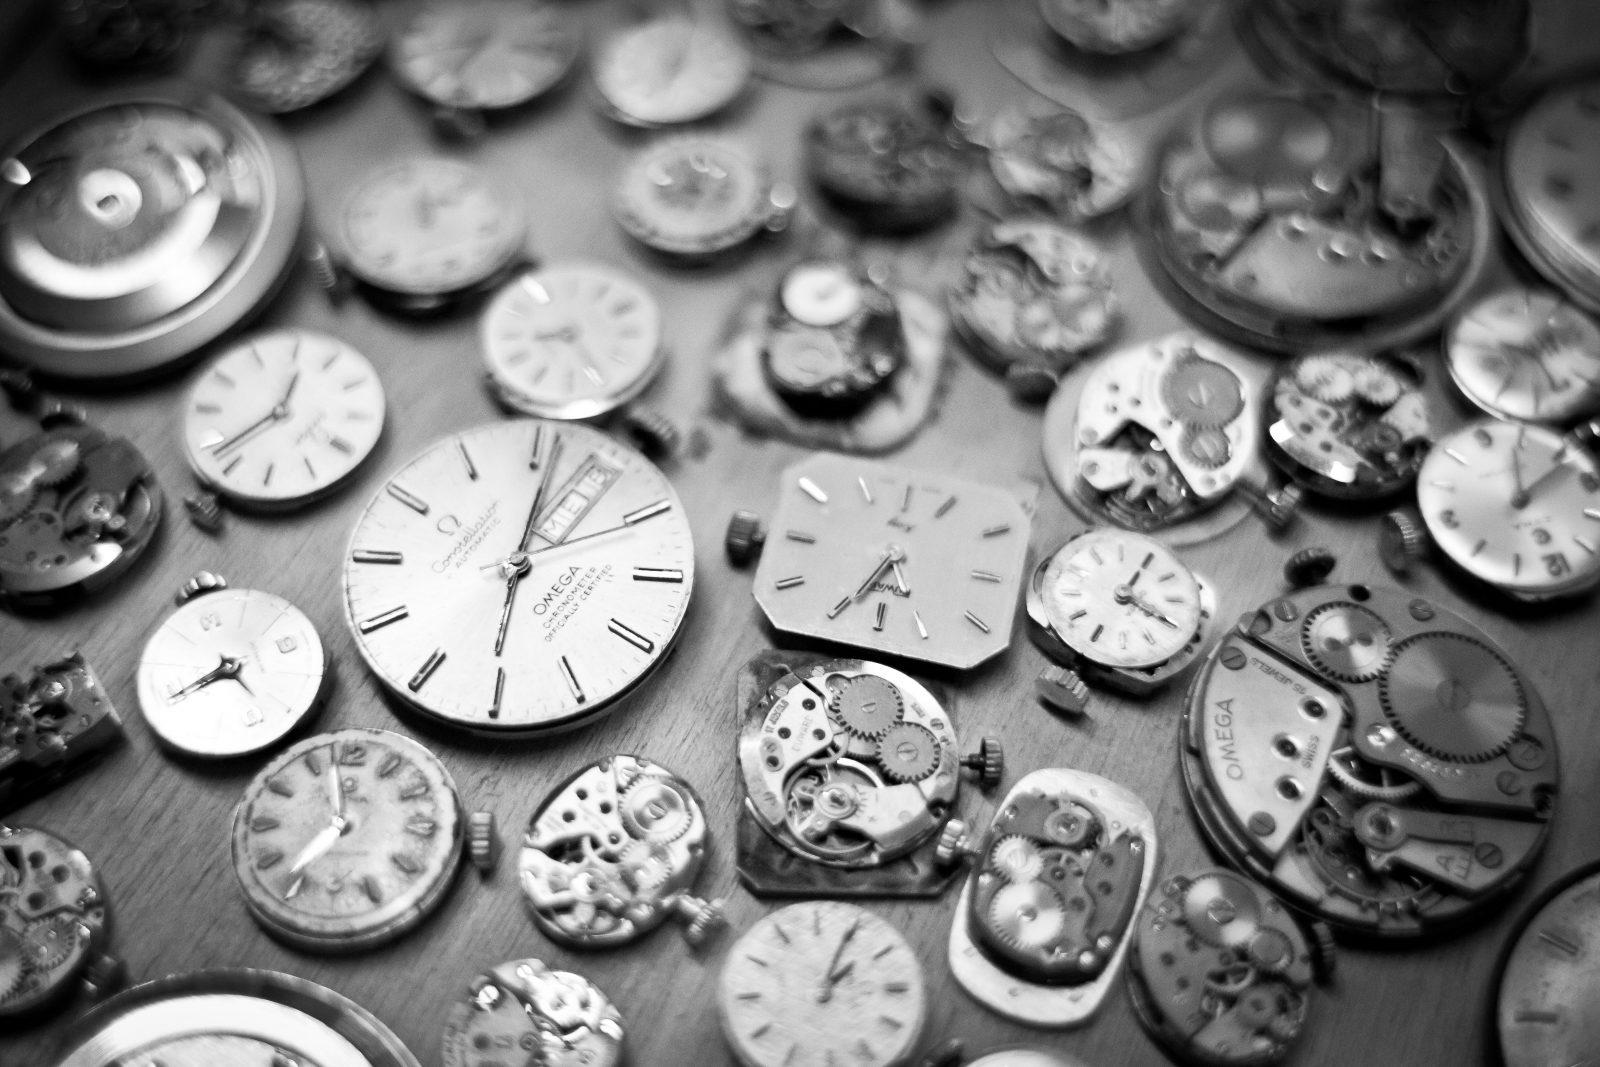 c77cbb00f030 Mi reloj no funciona